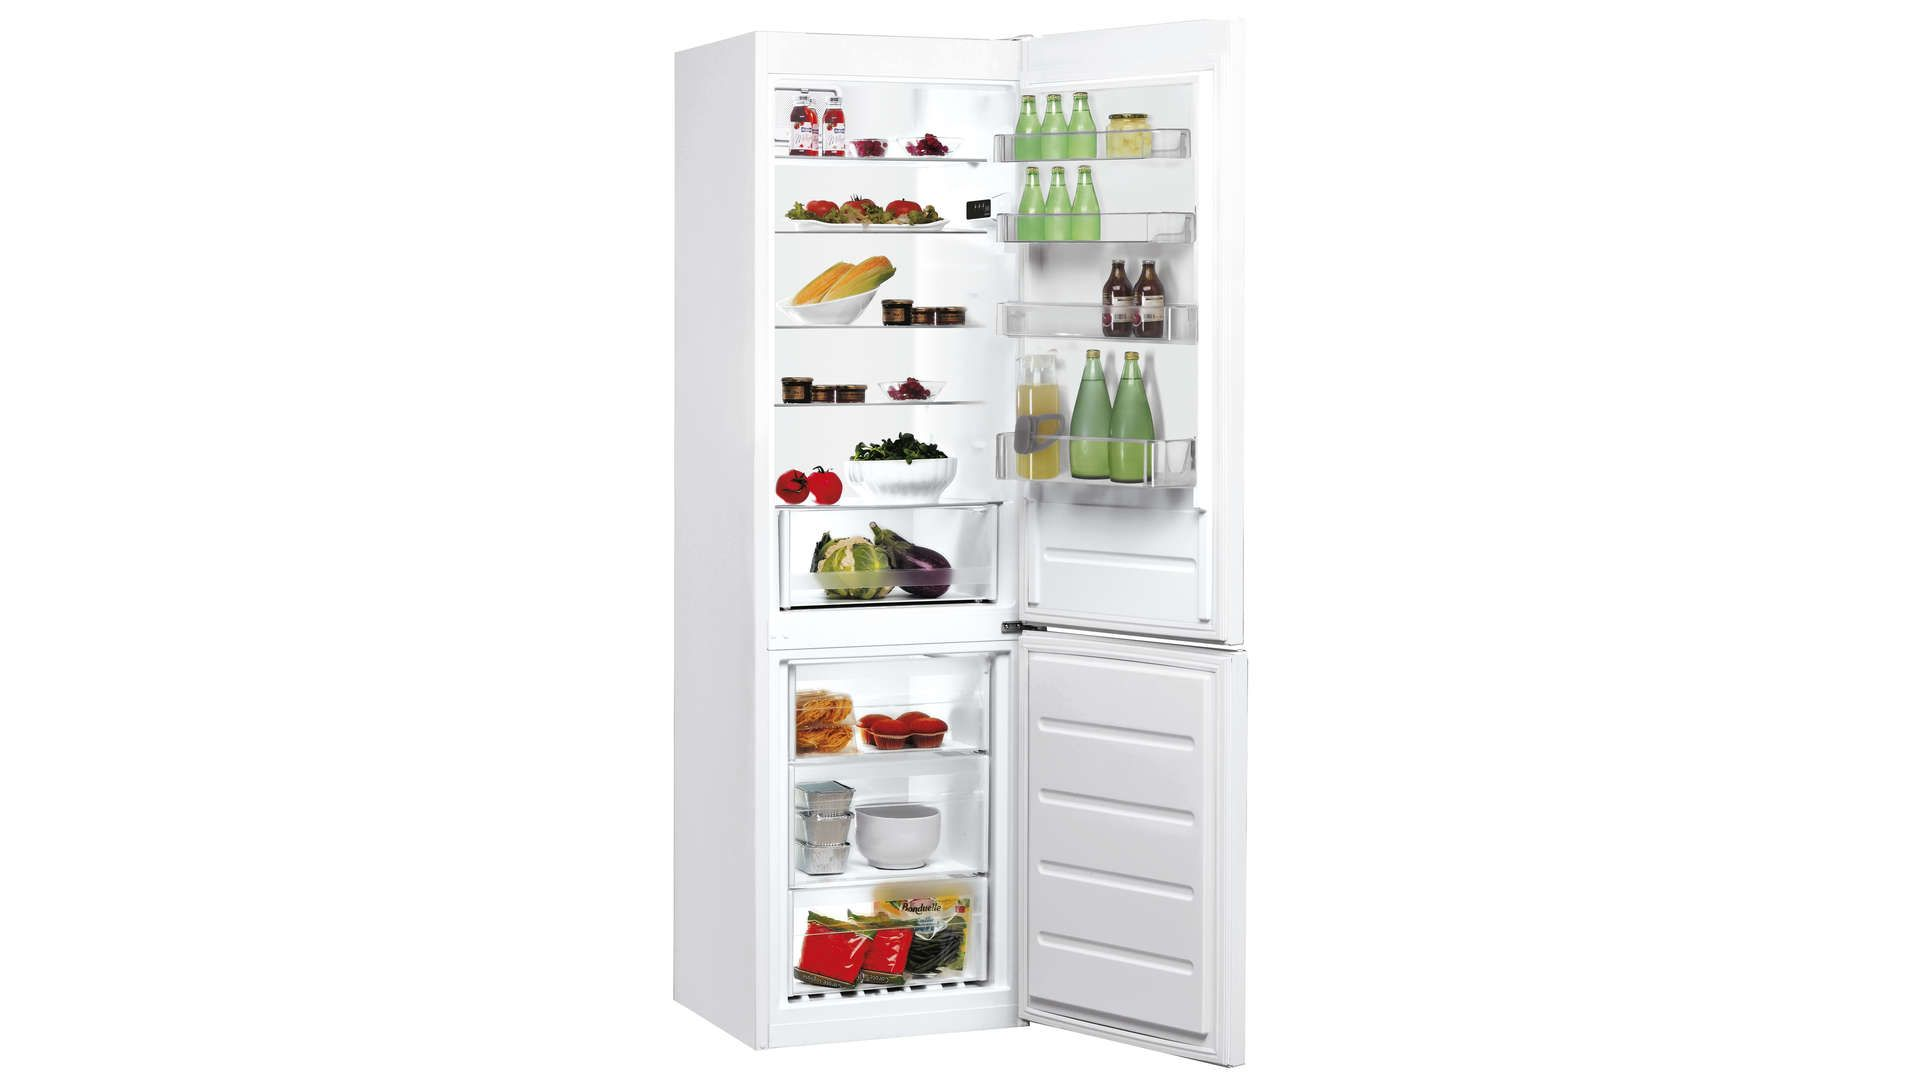 Refrigerateur Combine 368 Litres Indesit 645514 Refrigerateur Combine Refrigerateur Encastrable Et Gros Electromenager